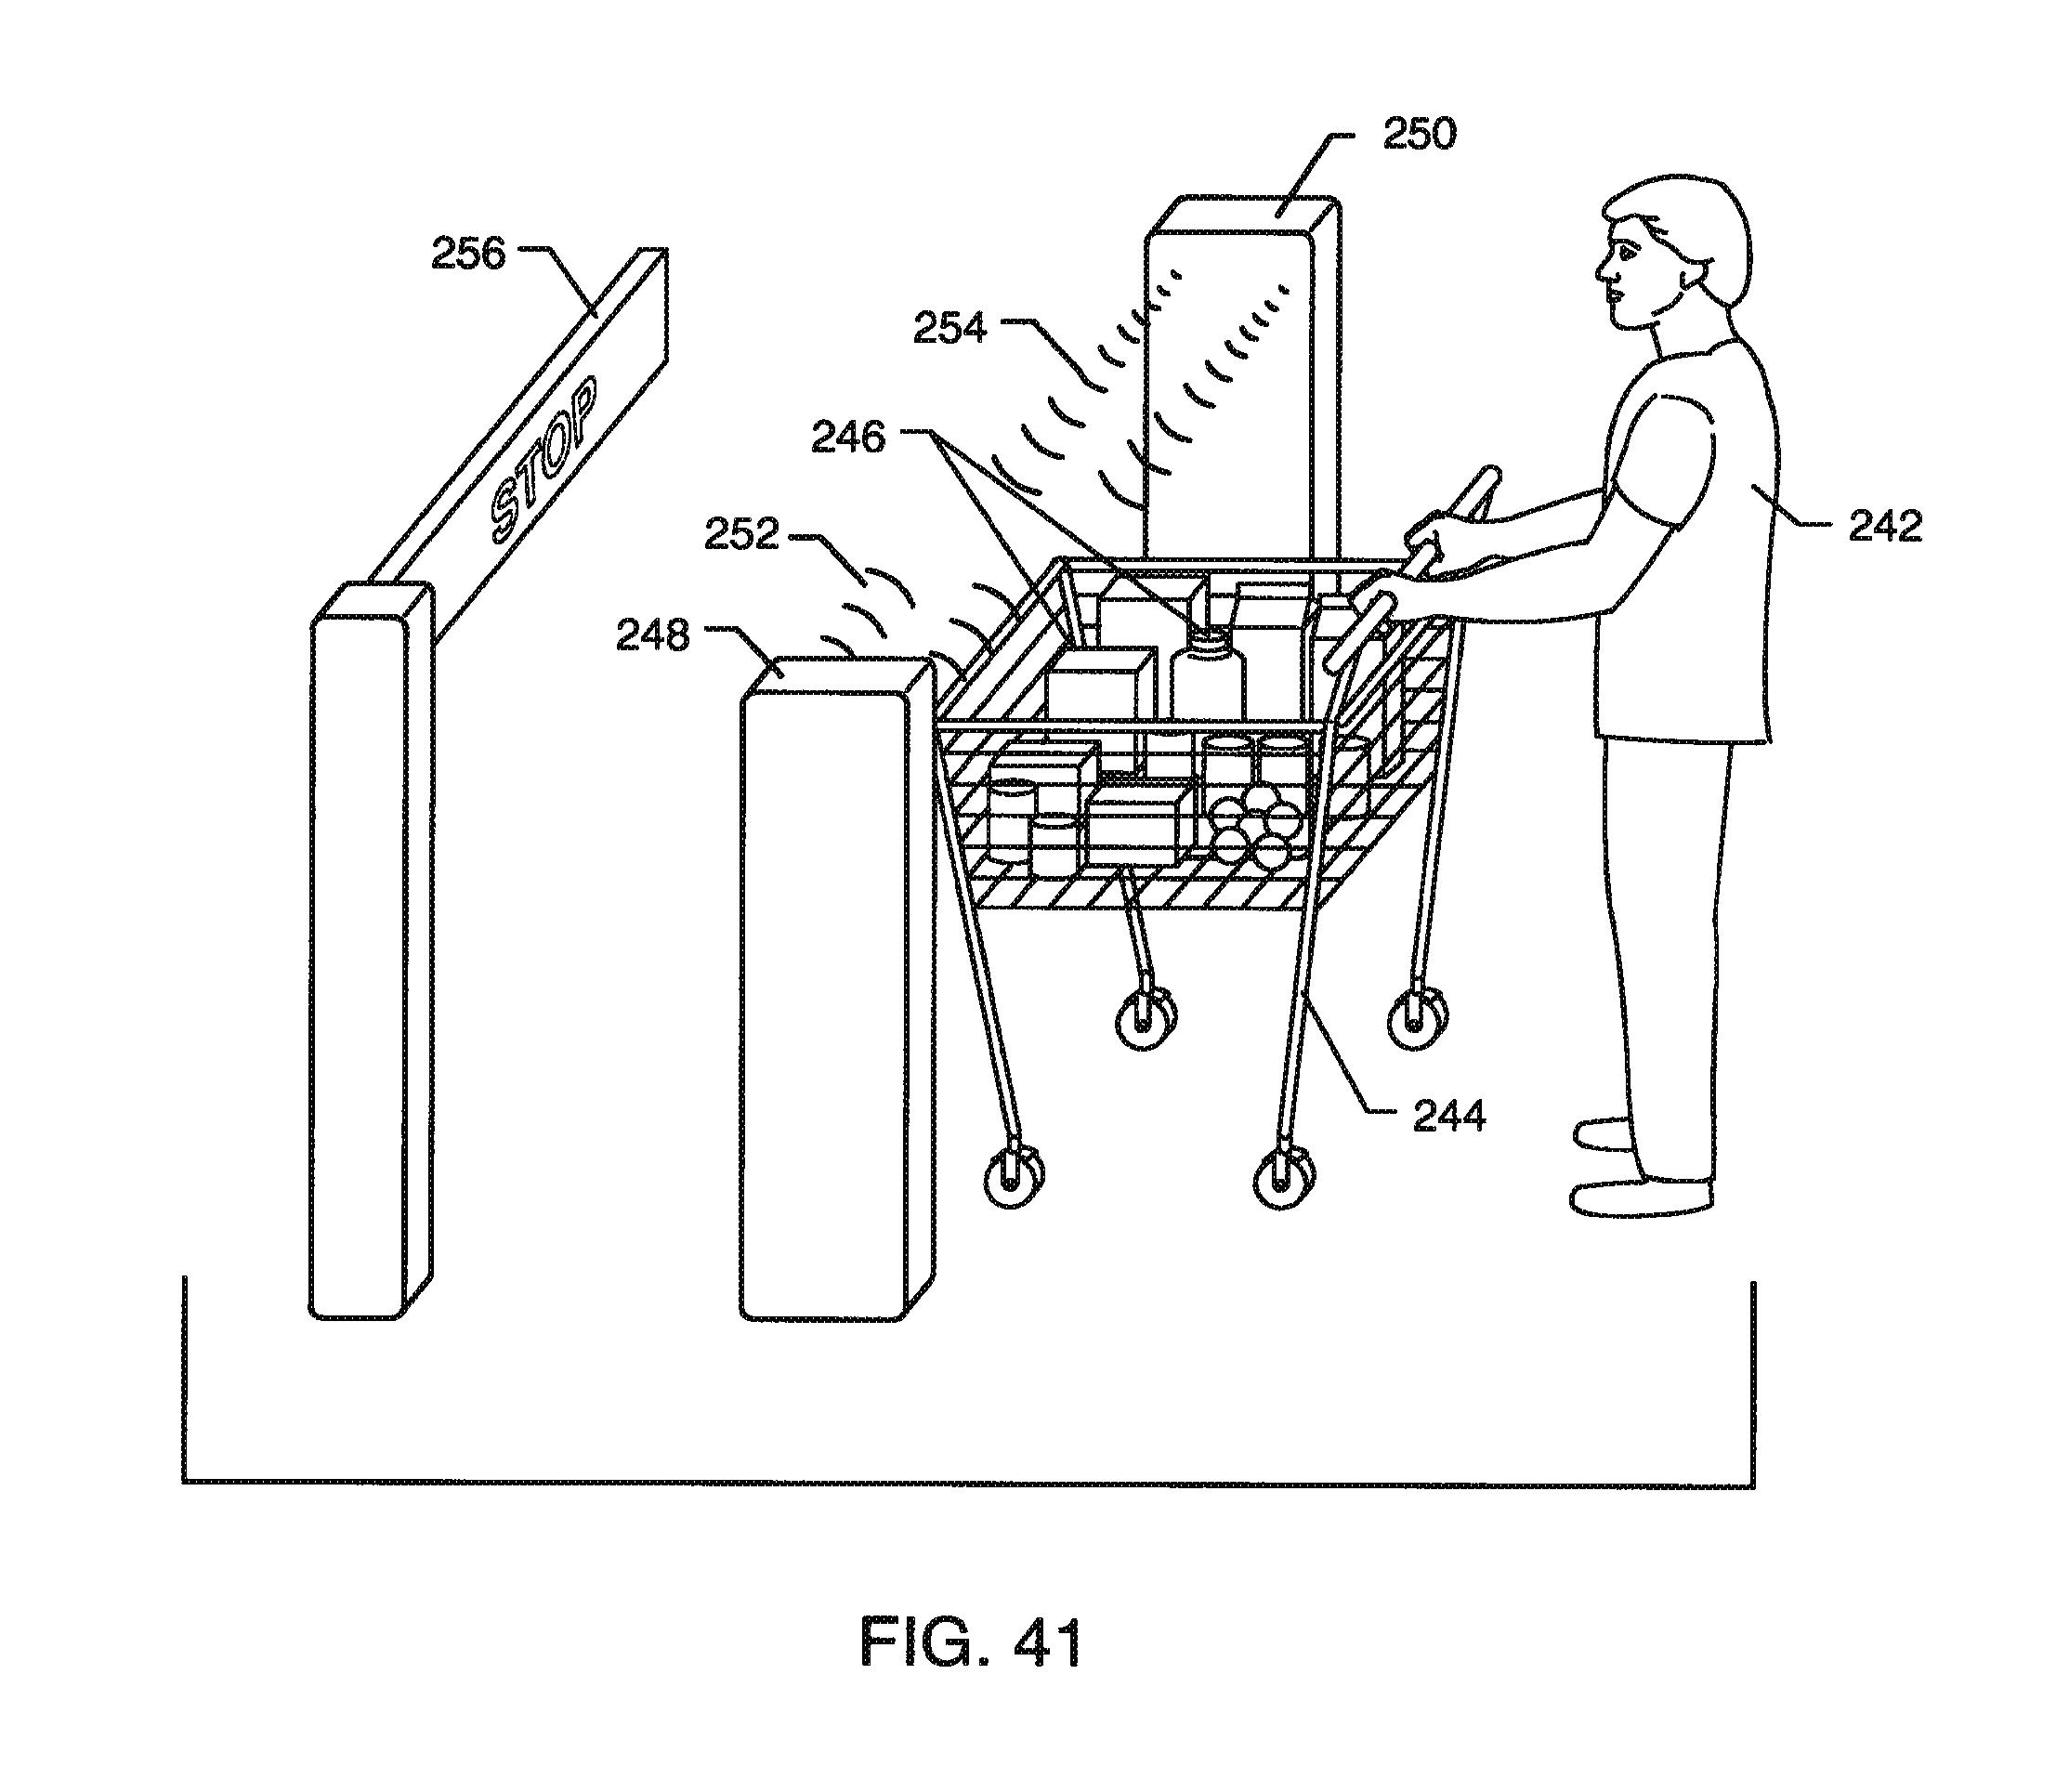 Patent Us8410899 Automobile Keyless Entry System Having An Rfid Daihatsu L5 Wiring Diagram Drawing